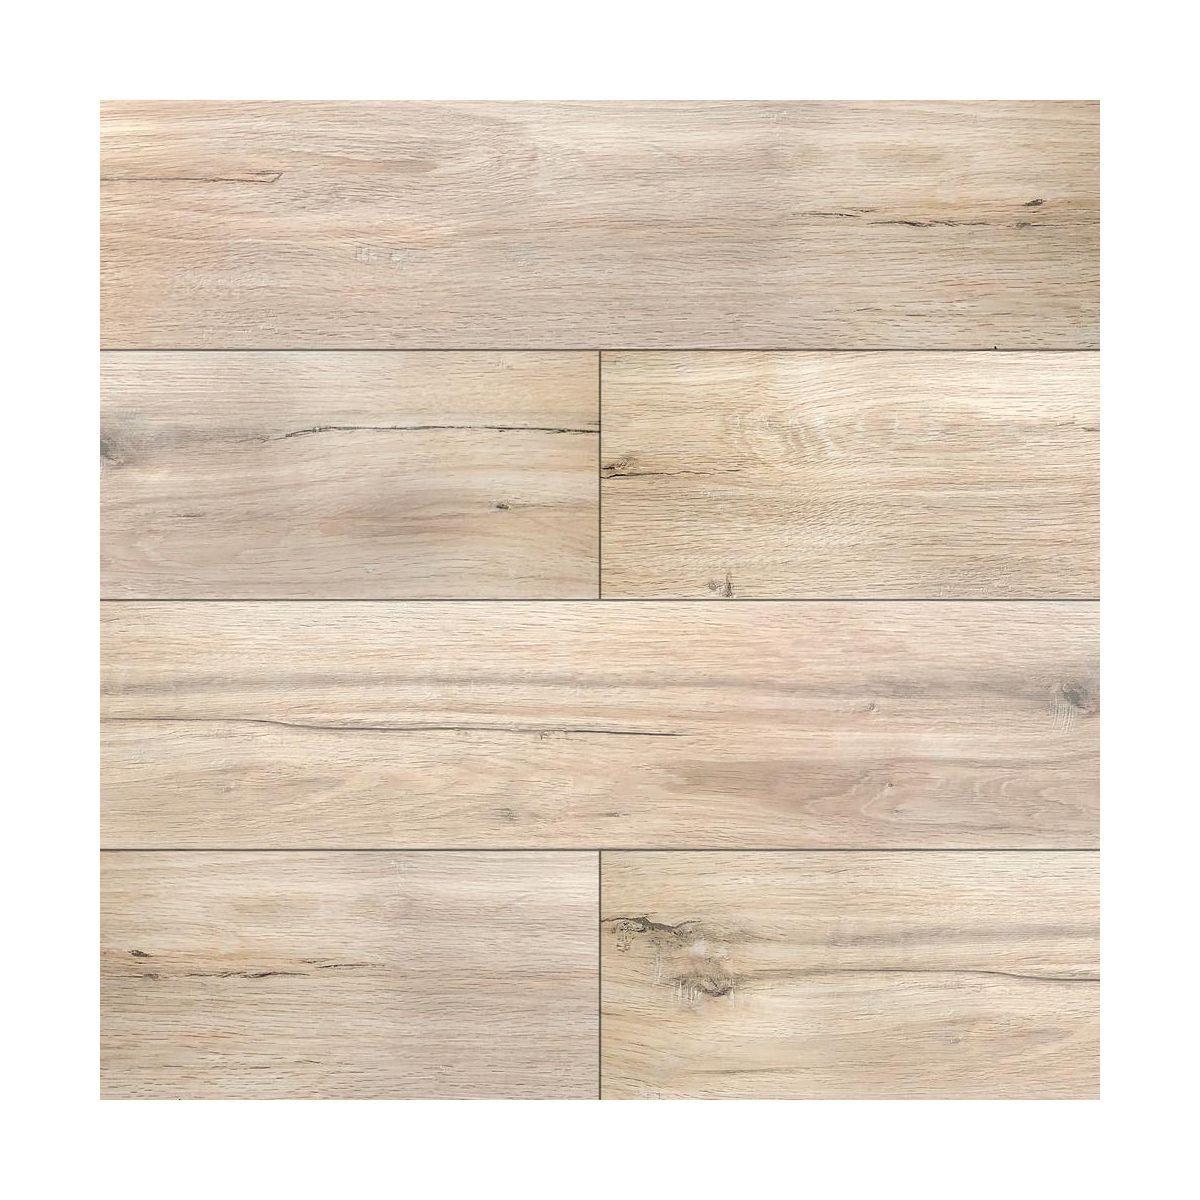 Panele Podlogowe Olimp Ac4 8 Mm Home Inspire Panele Podlogowe Laminowane W Atrakcyjnej Cenie W Sklepach Leroy Merlin Flooring Hardwood Hardwood Floors